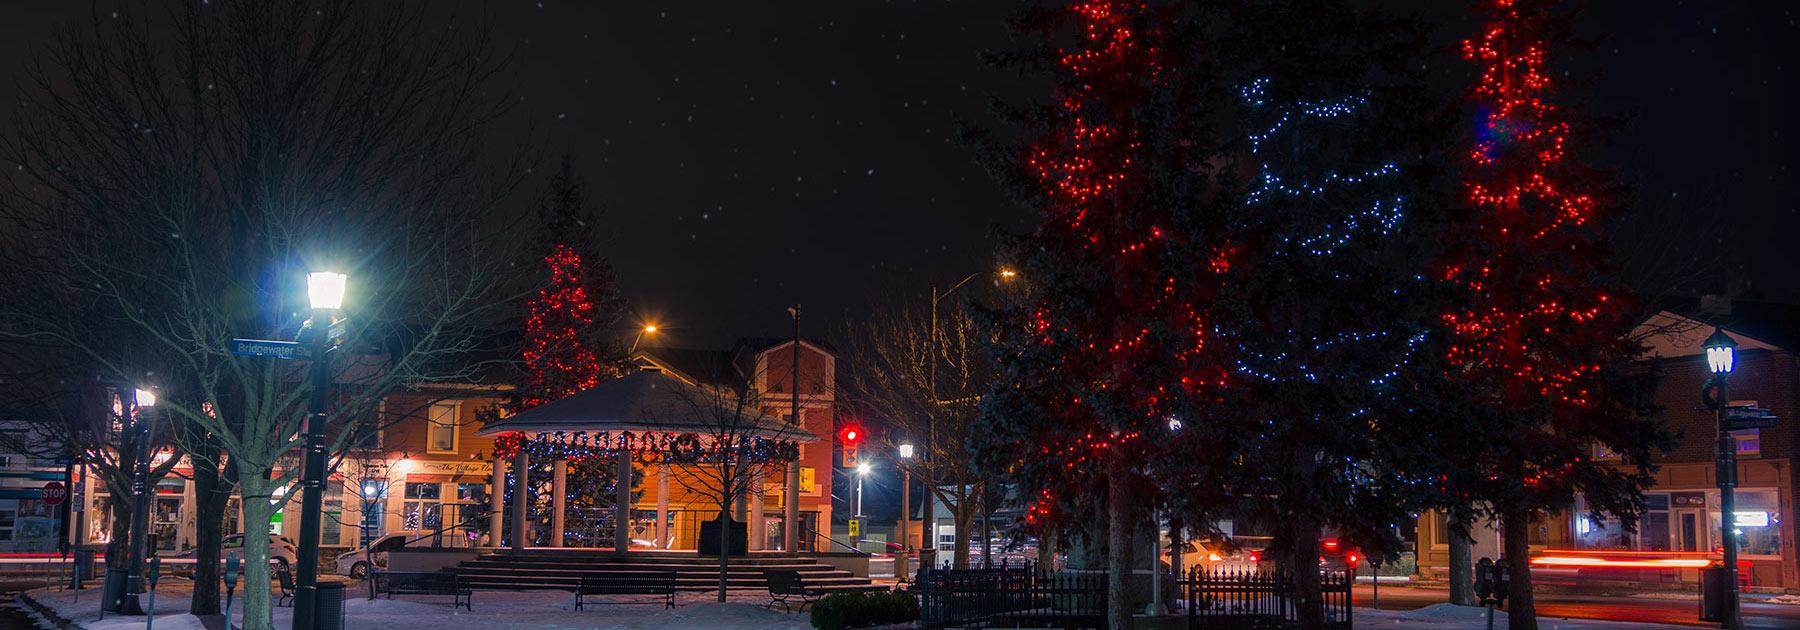 Lights in Cummington Square Chippawa Niagara Falls